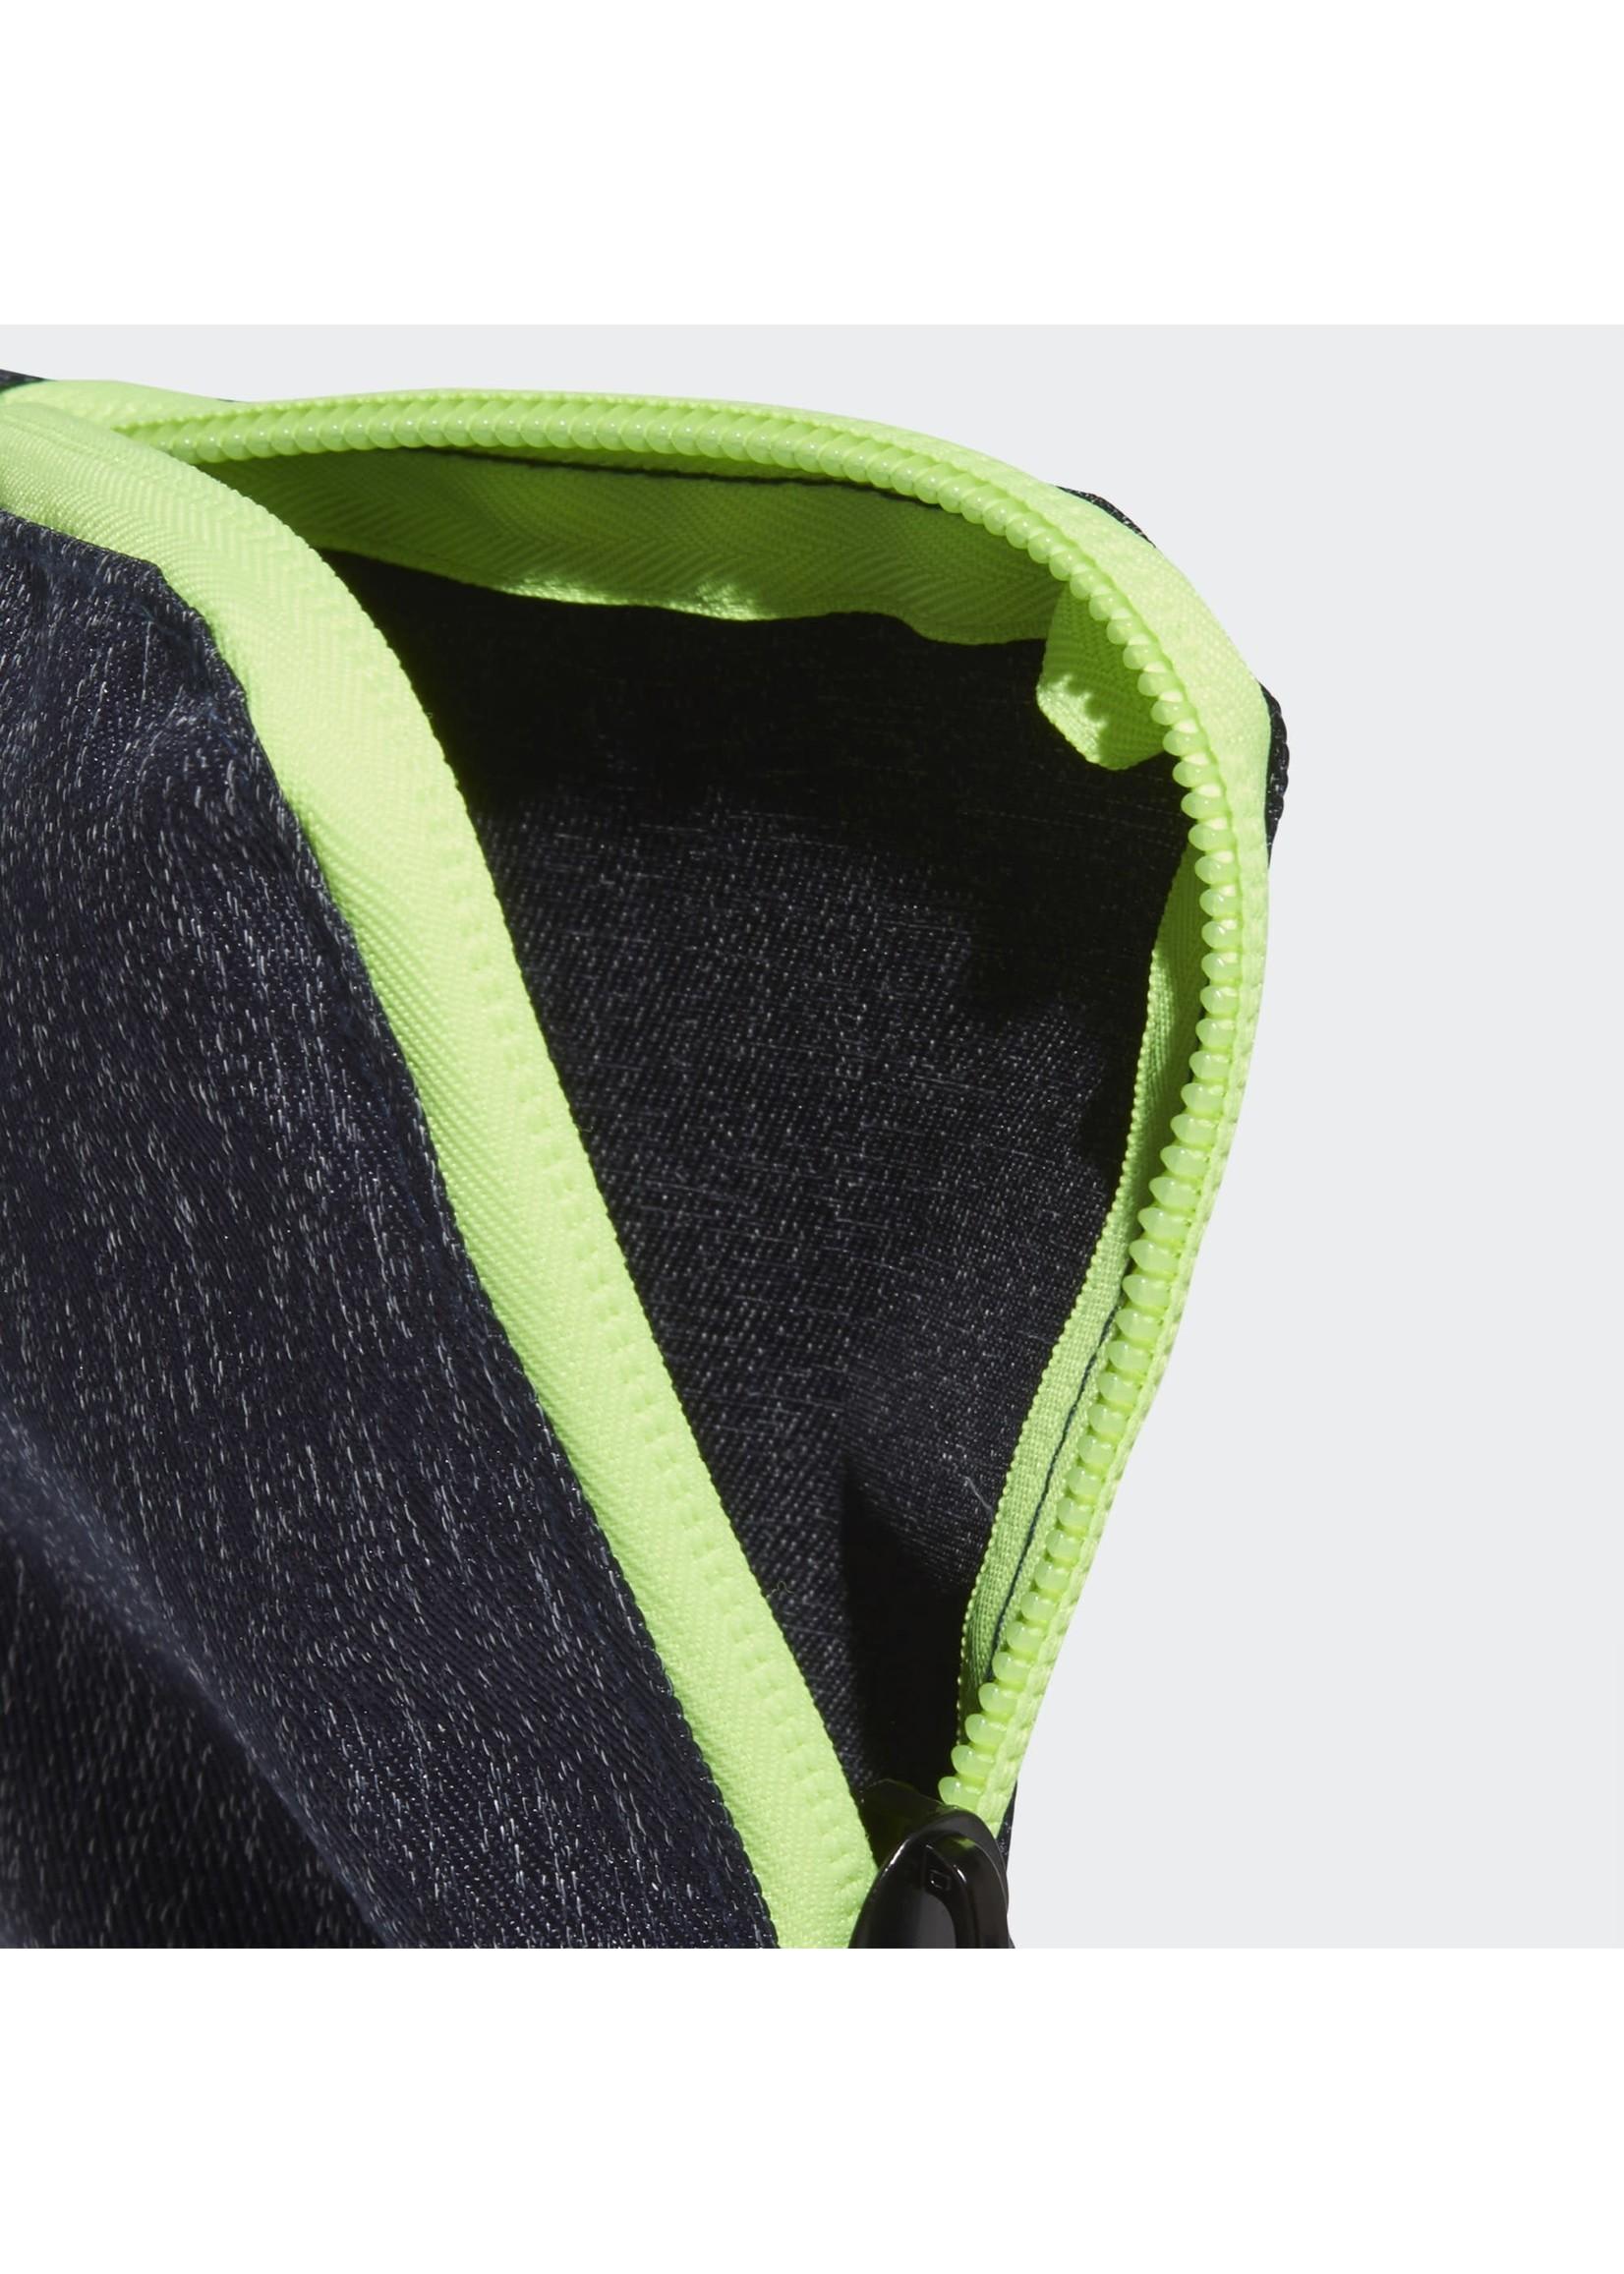 Adidas Adidas VS2 Hockey Stick Sleeve (2020) - Various Colours